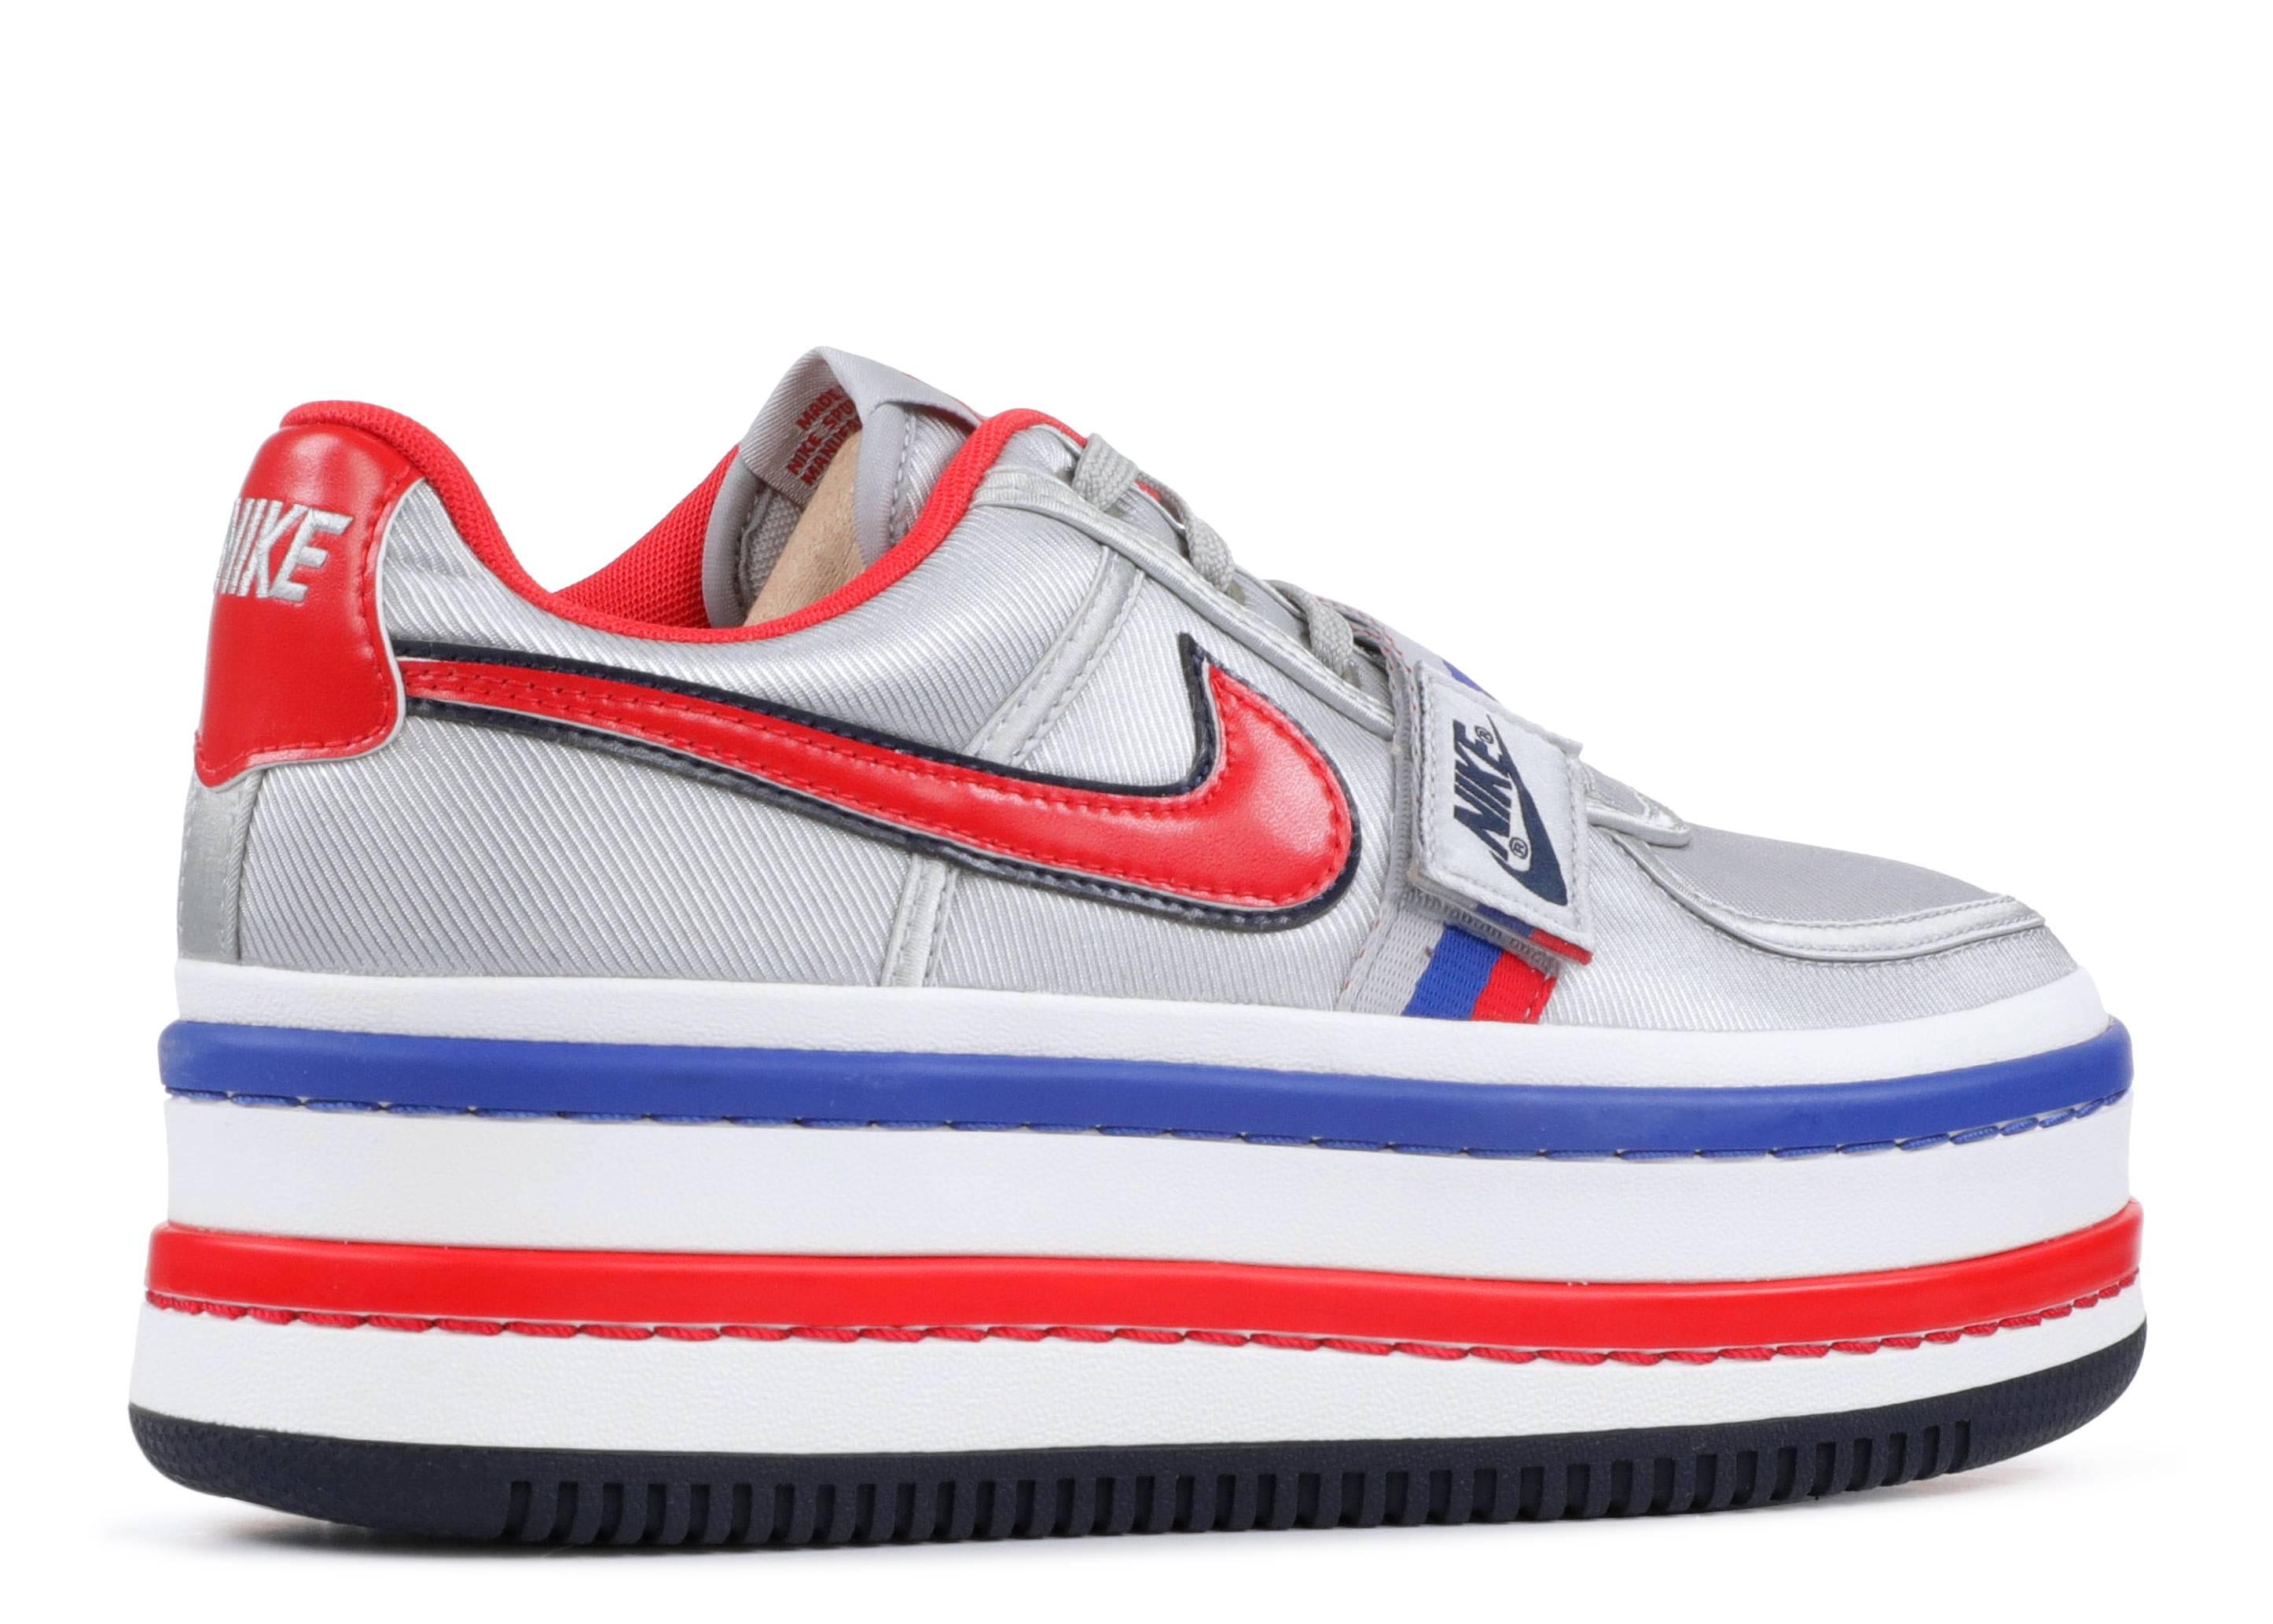 669c276abd8 W Nike Vandal 2x - Nike - AO2868 001 - metallic silver university red